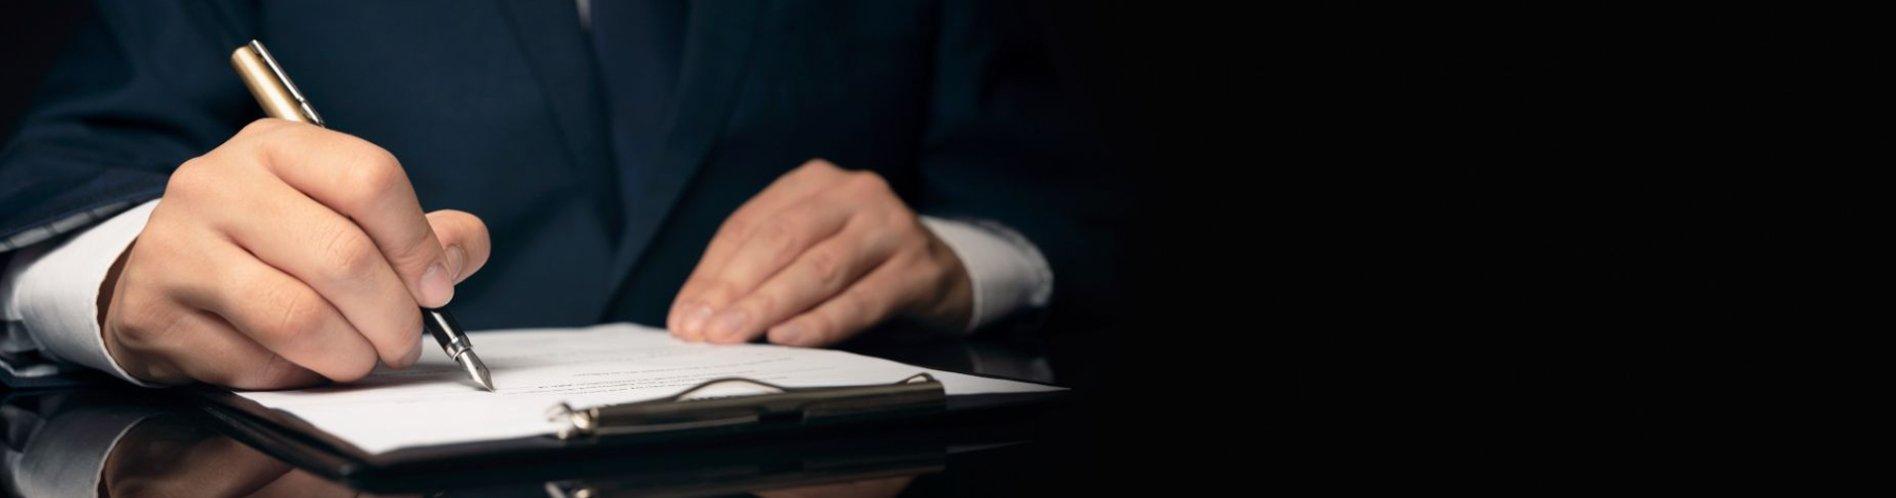 Testimonials for Harvey Katz Law clients